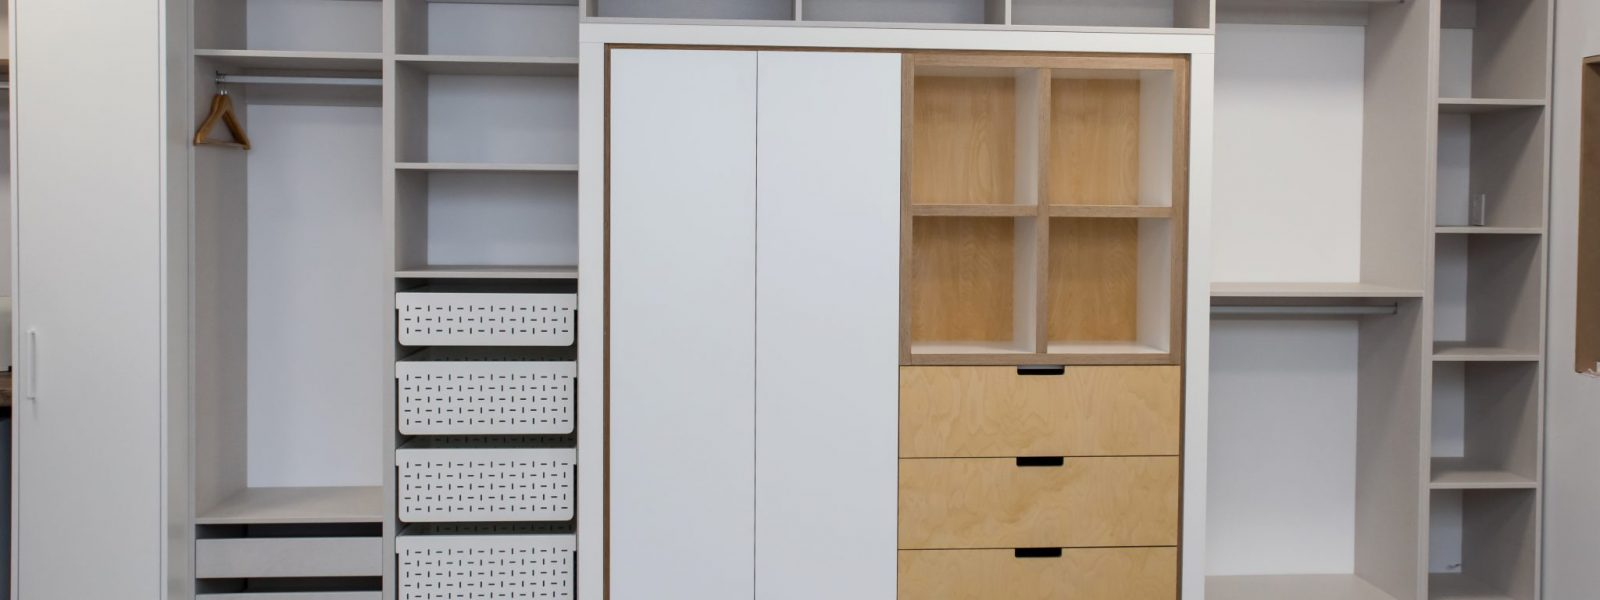 Wardrobes & Cabinets - Header Image